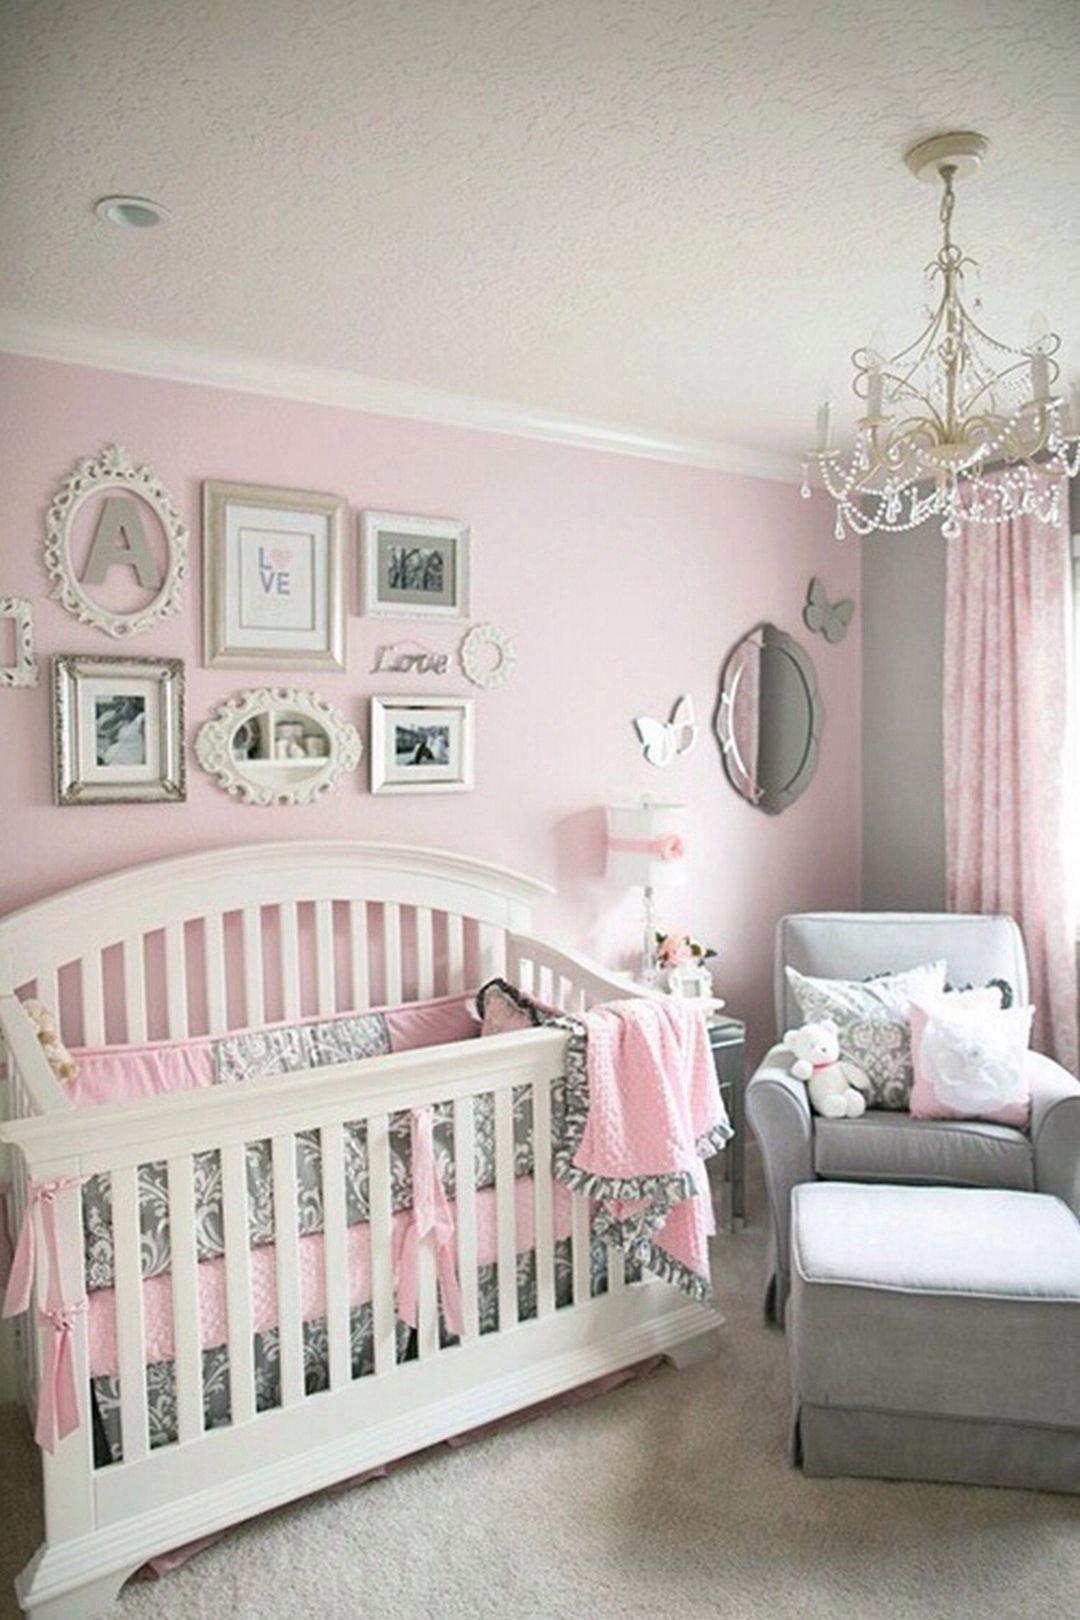 10 Spectacular Baby Nursery Ideas For Girls 6 actionable tips on baby girl nursery nursery babies and girls 2 2021